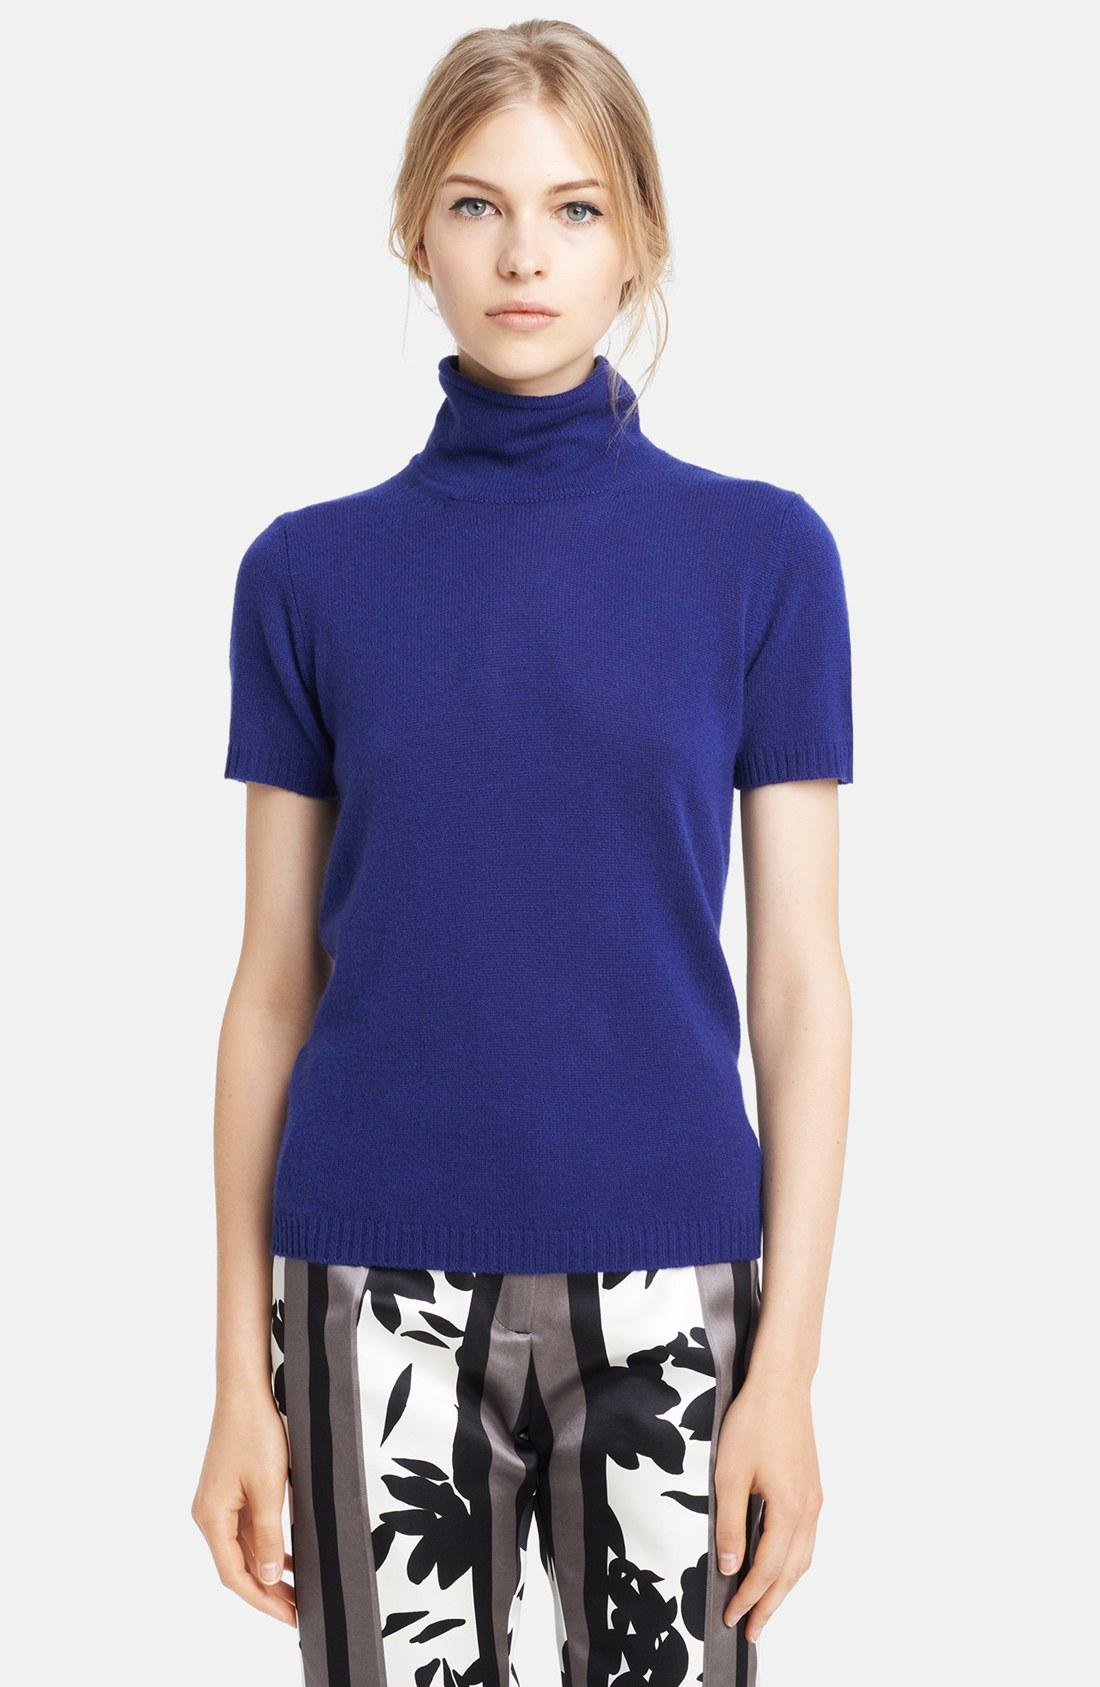 Marni Short Sleeve Cashmere Turtleneck In Blue Ocean Lyst